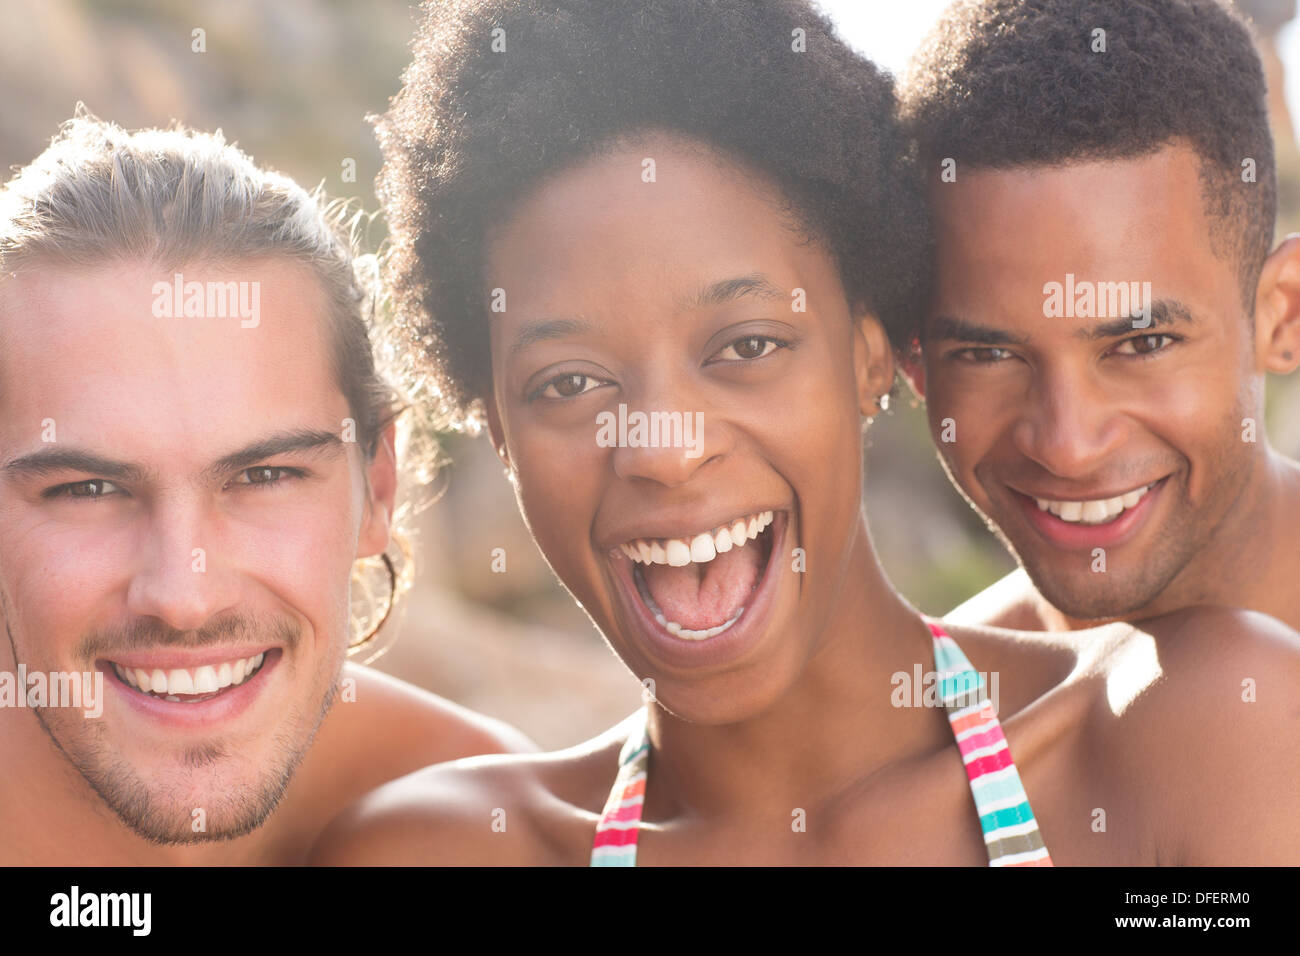 Portrait of smiling friends Photo Stock